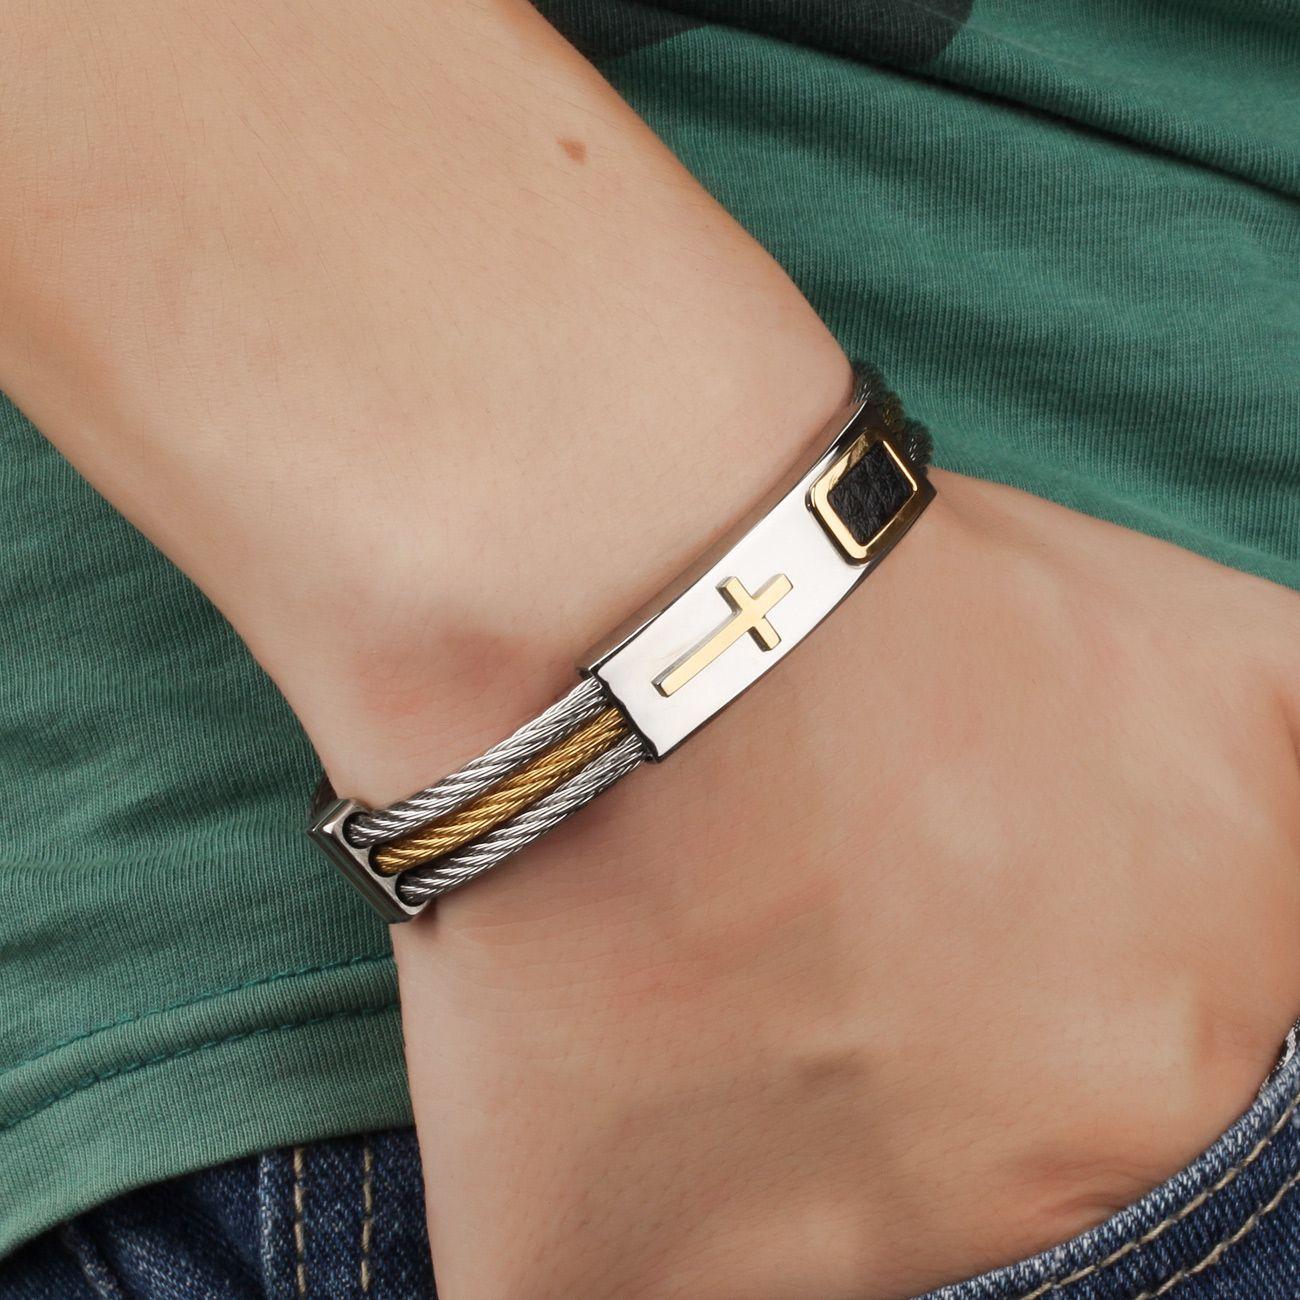 LASPERAL Stainless Steel Male Bracelet 3Rows Wire Chain Bracelets ... 89e2405d955d